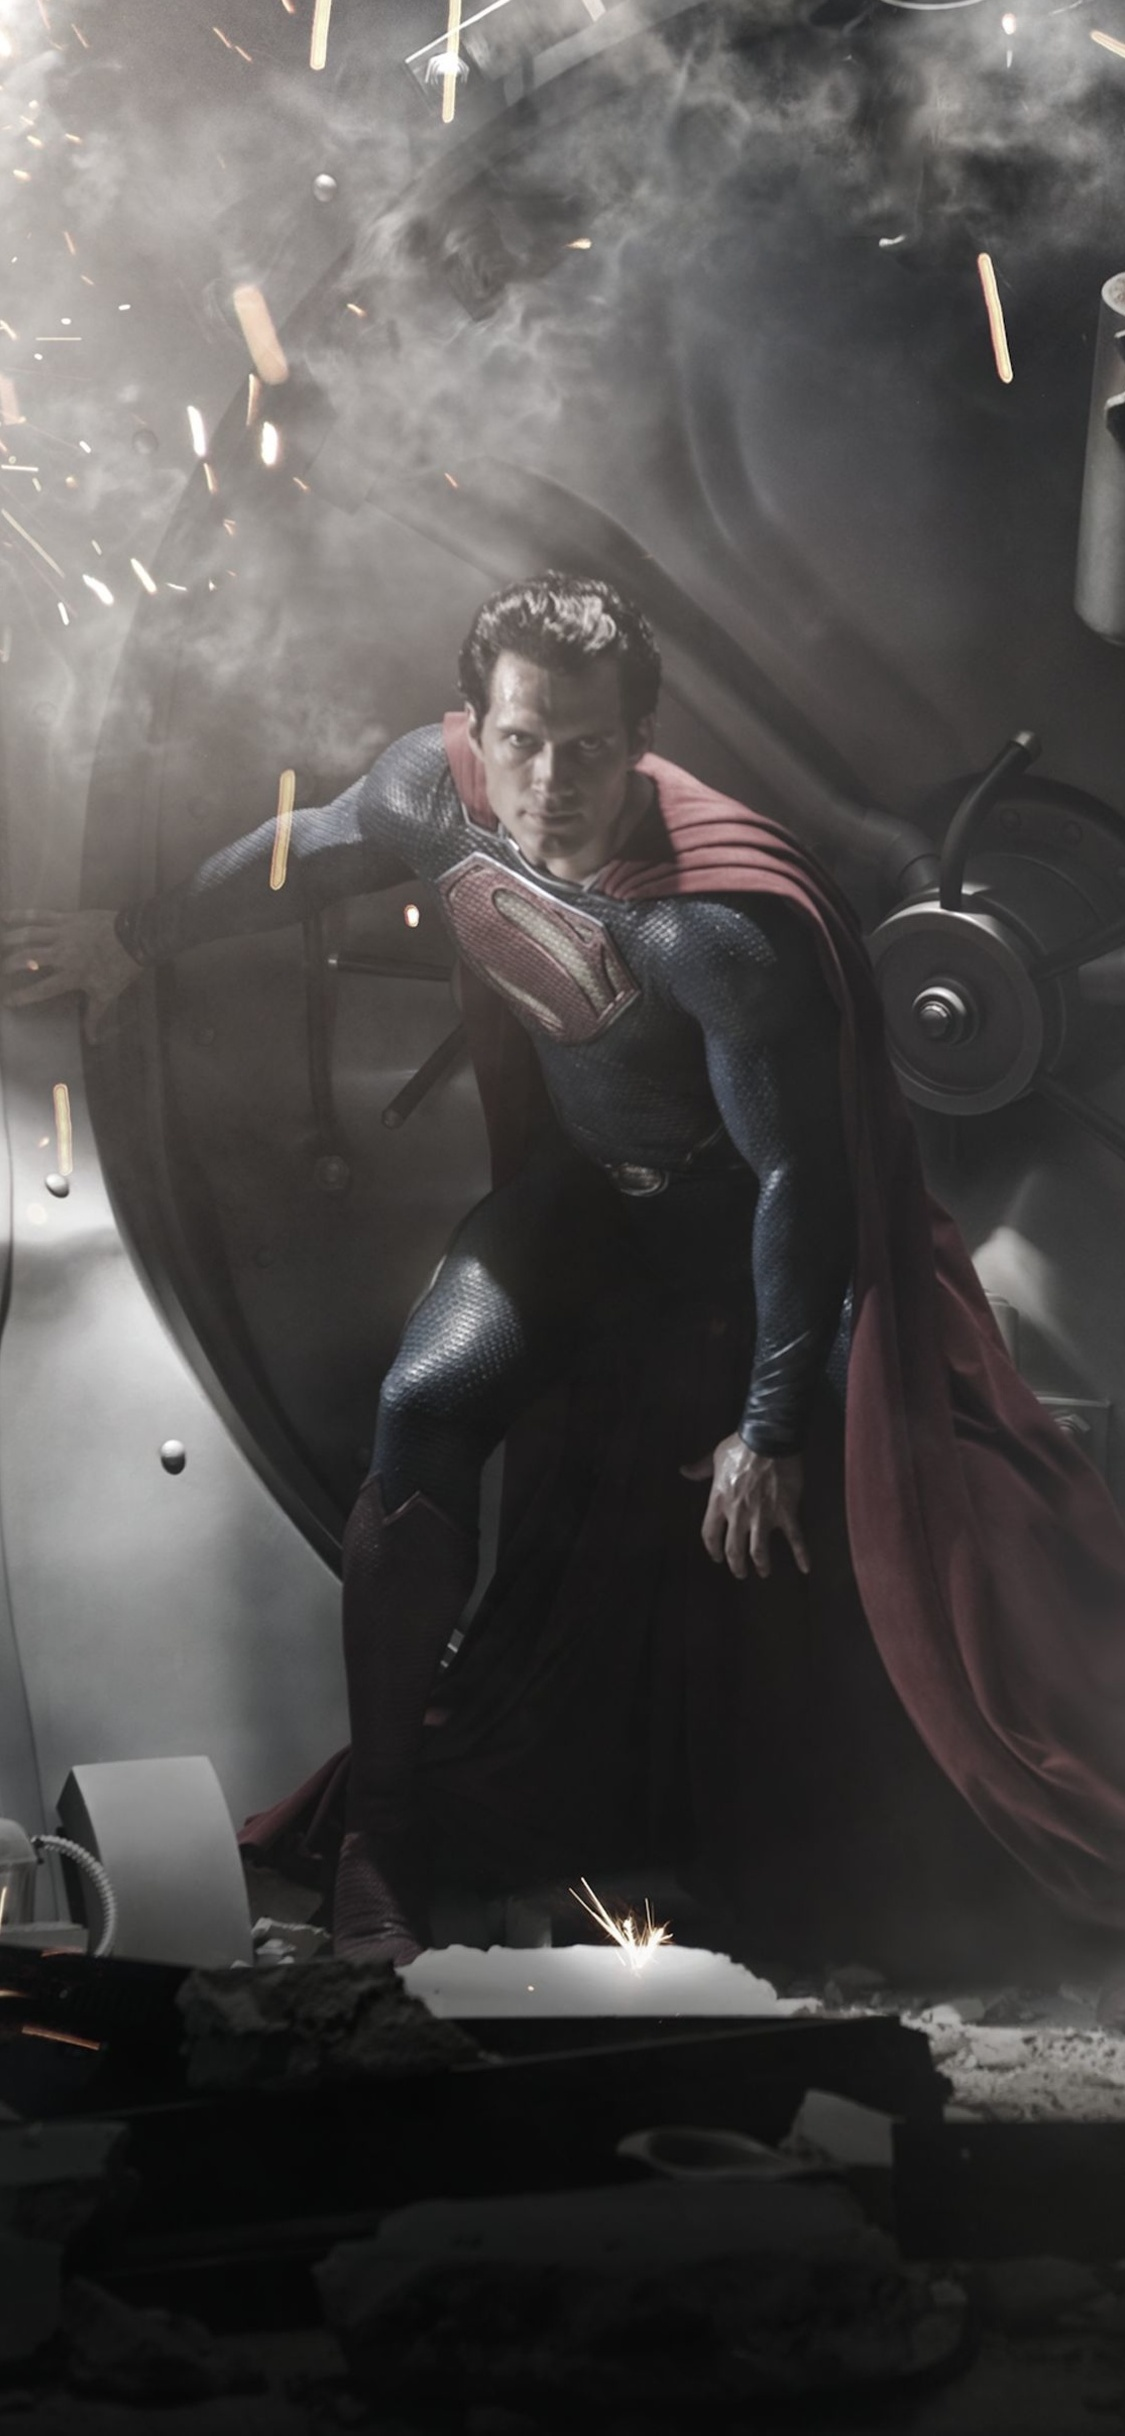 1125x2436 Man Of Steel Superman 4k Iphone Xs Iphone 10 Iphone X Hd